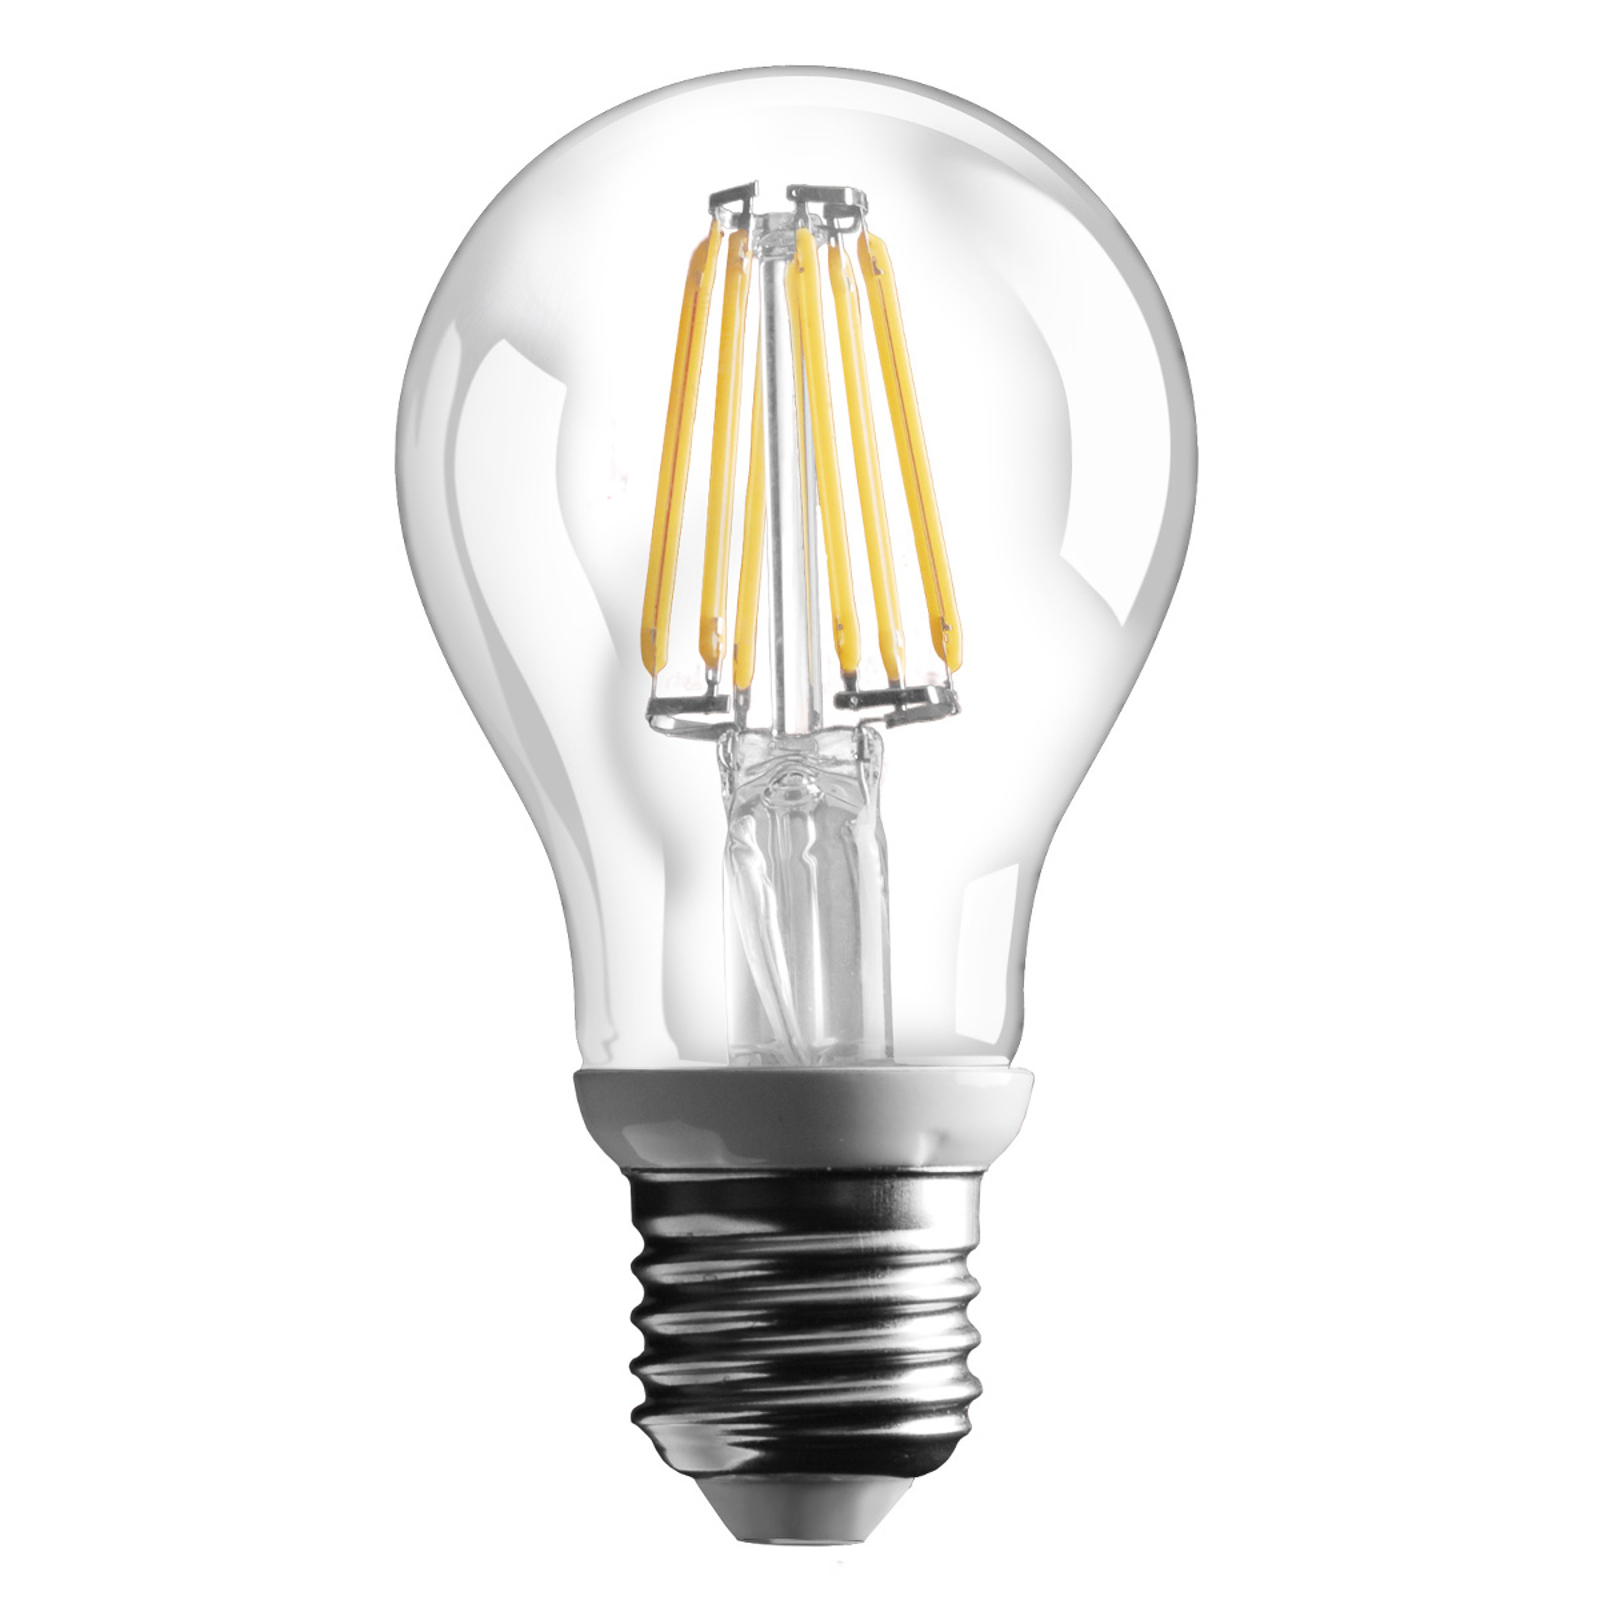 E27 6W LED filamentlamp met 800 lm - warmwit